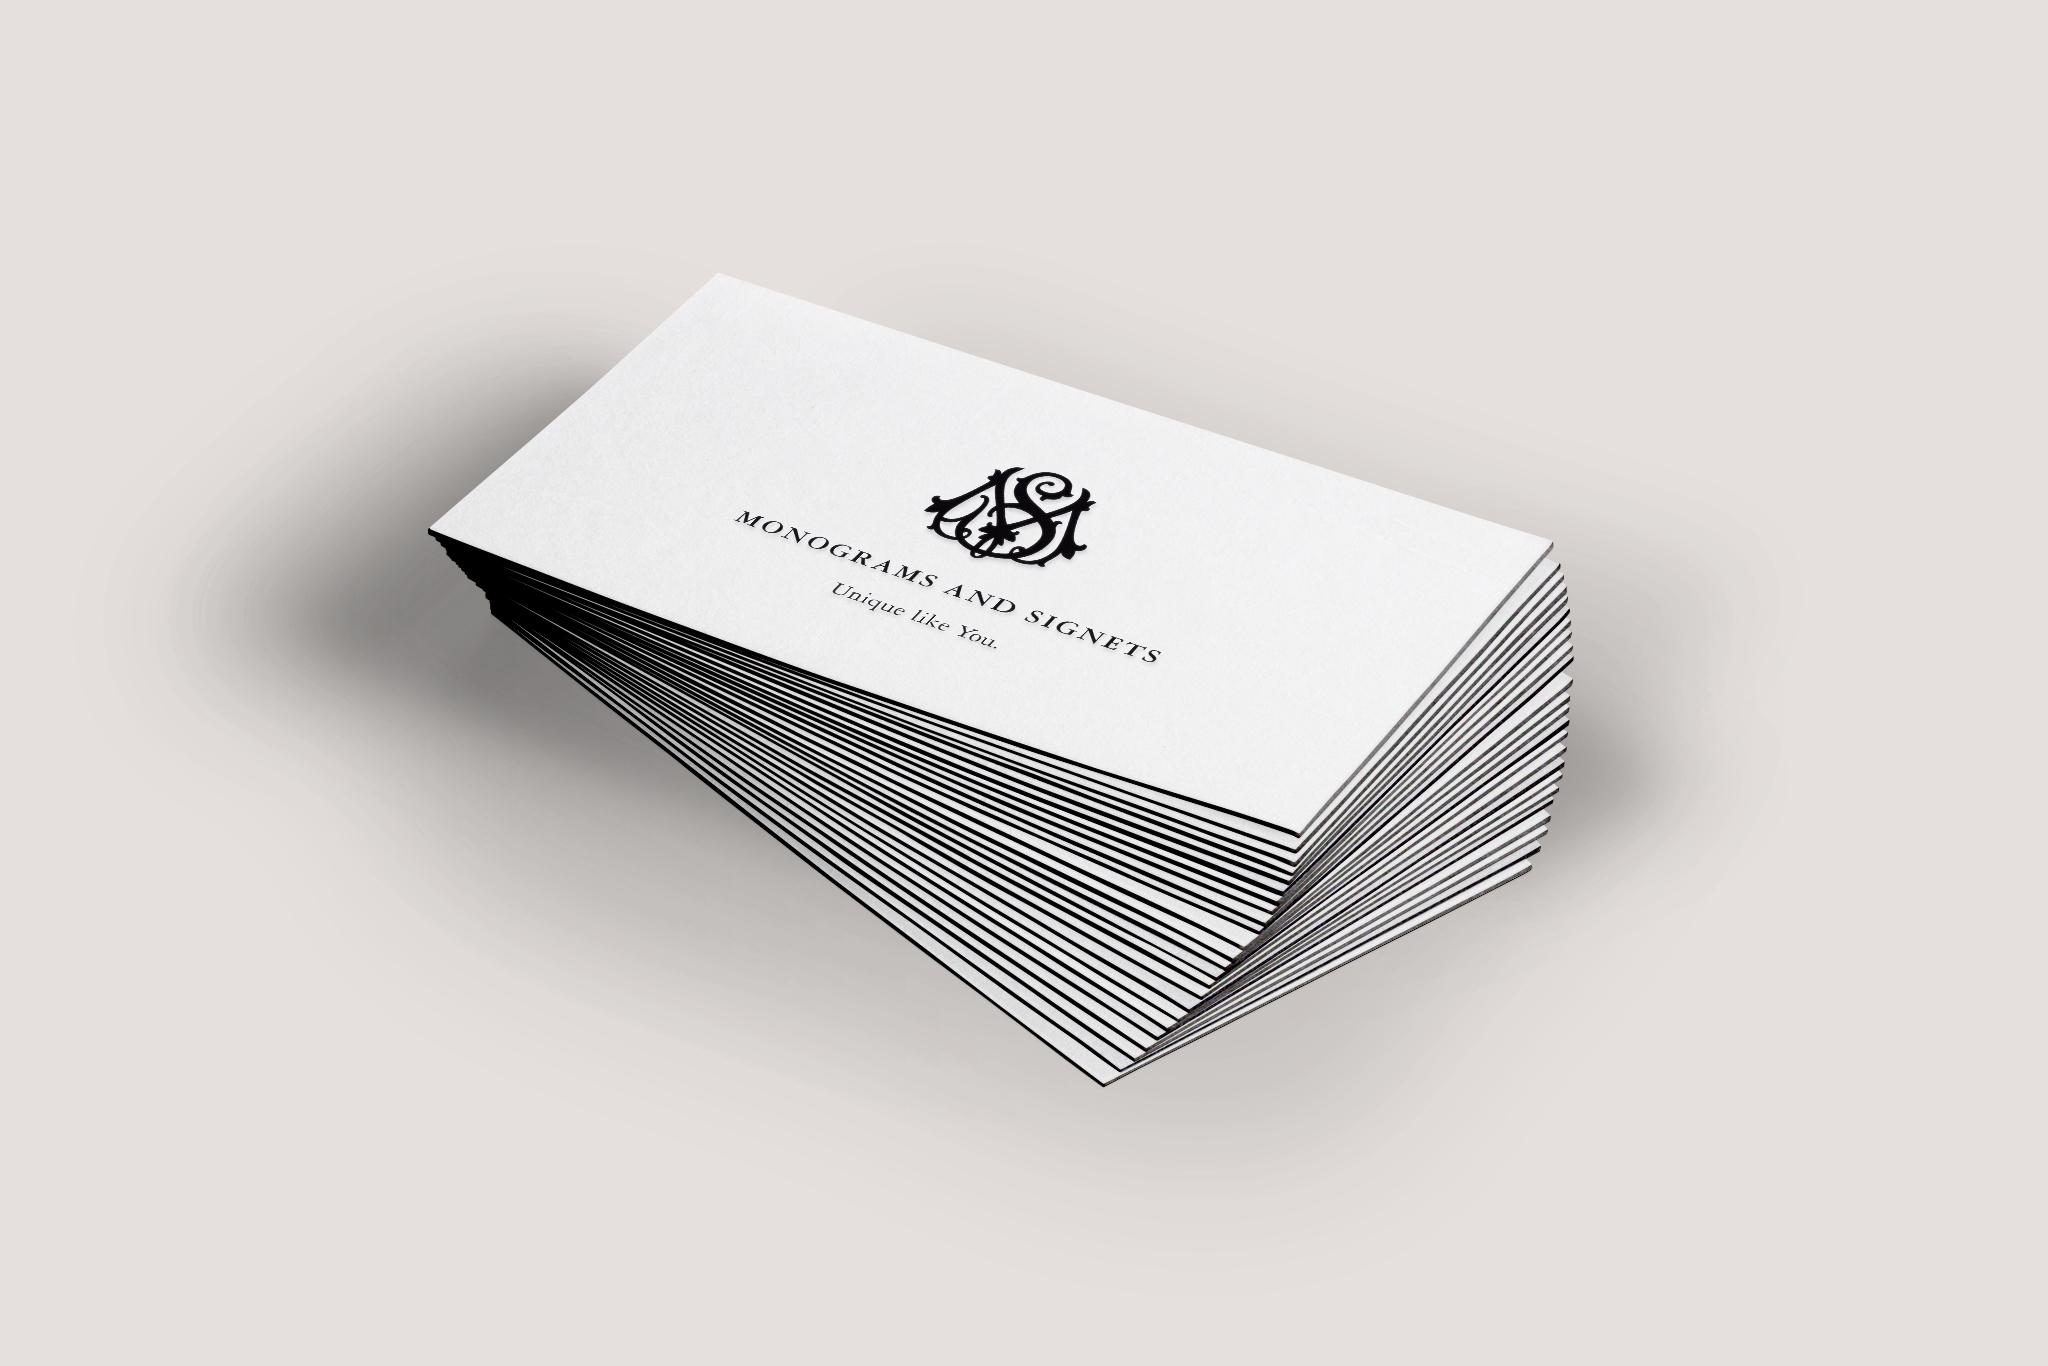 monogrammsandsignets_visitenkarten